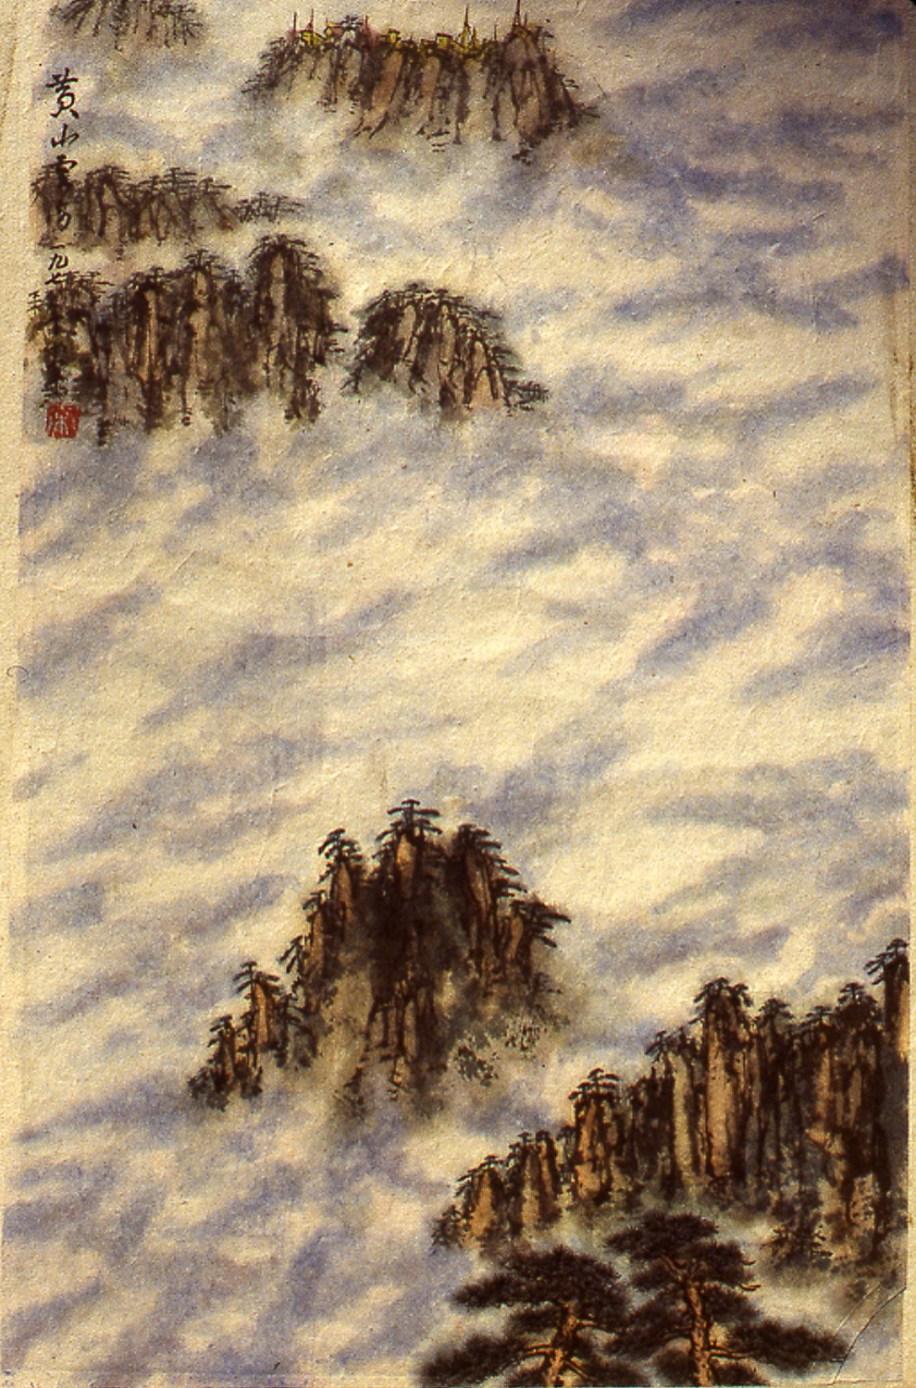 Image of Mountain treetops through fog